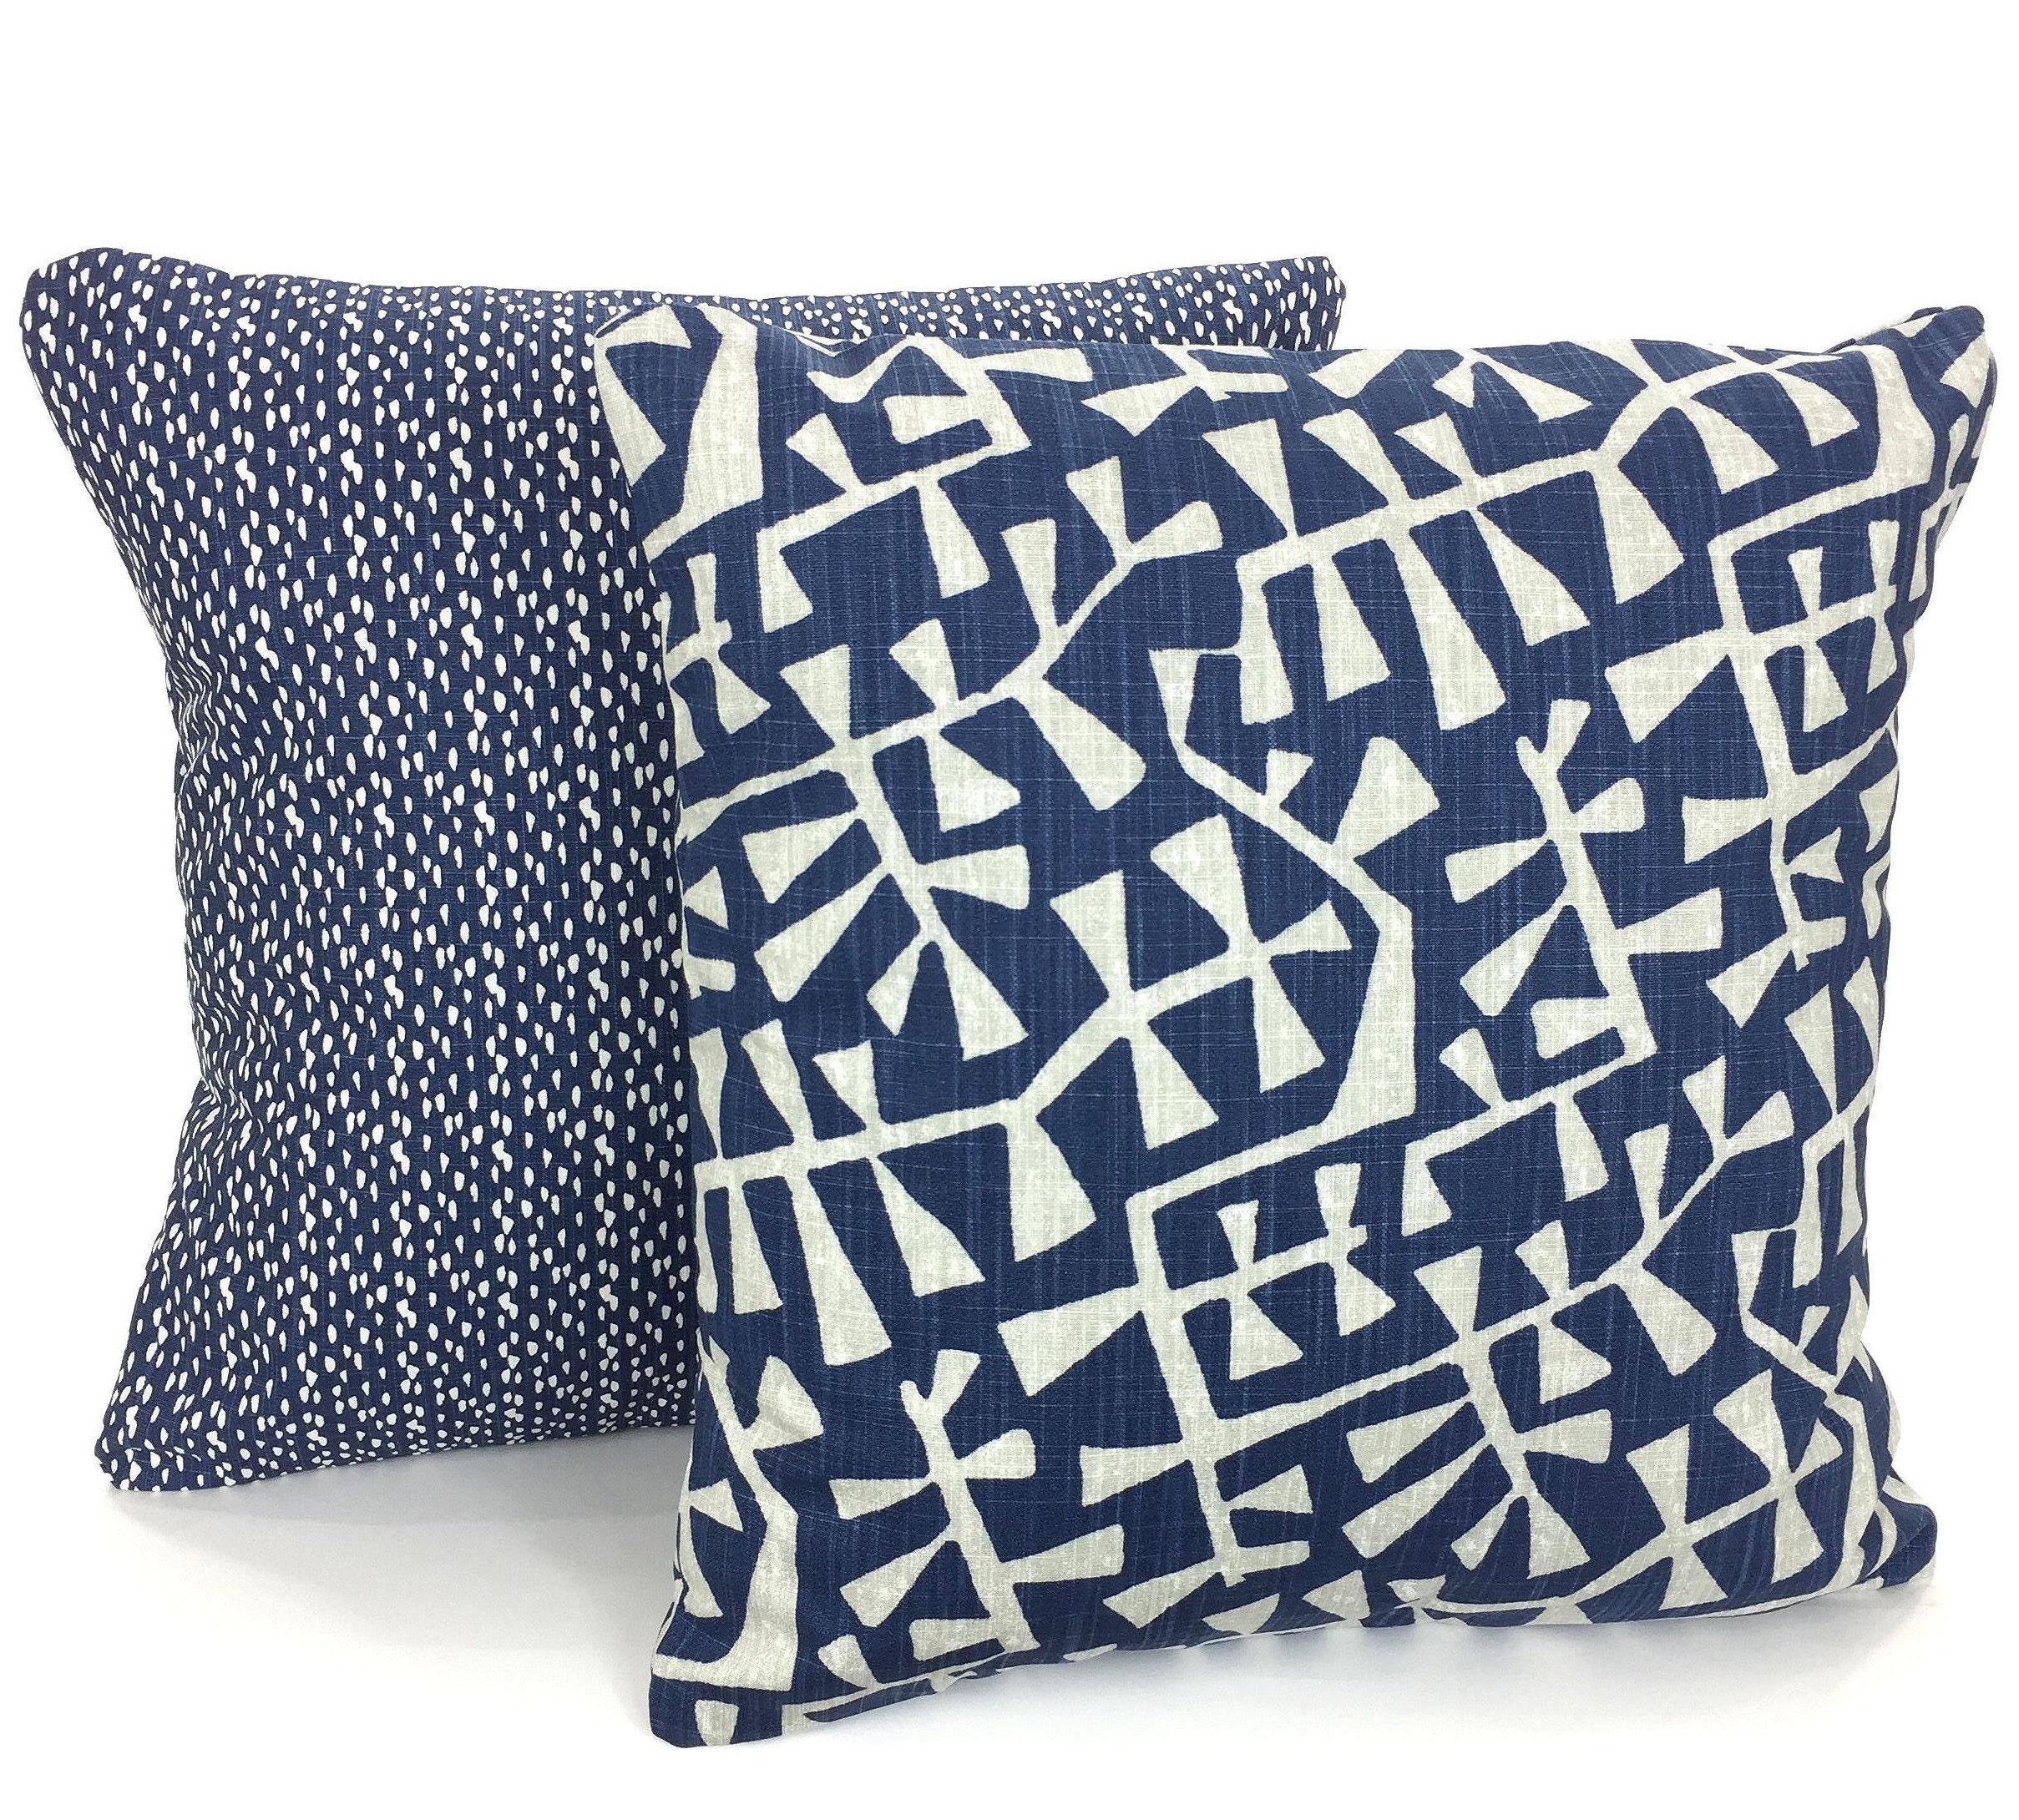 Pillow Covers Blue Gray White Decorative Throw Pillows Cushion